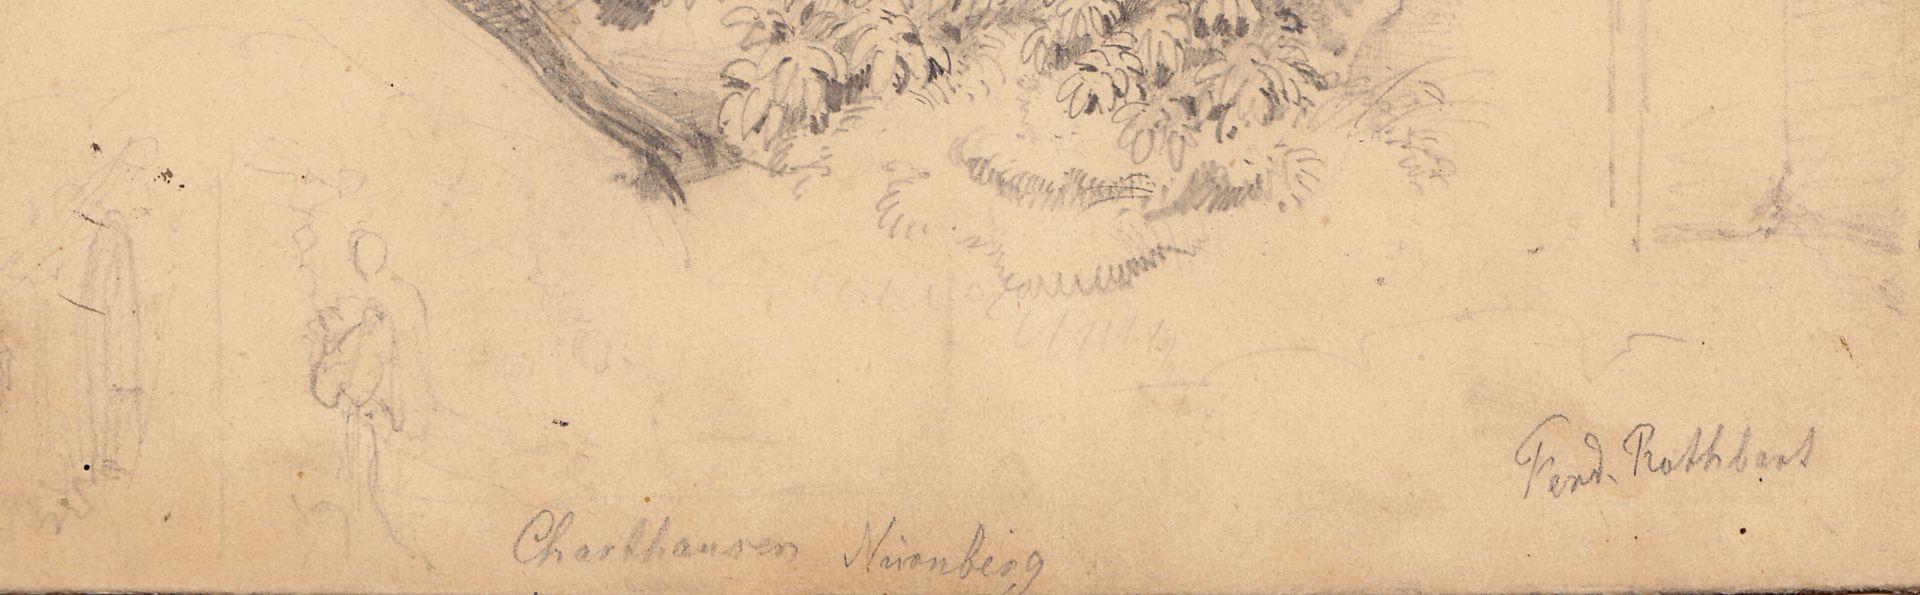 Carthusian Monastery in Nuremberg / Study Figure study and signature